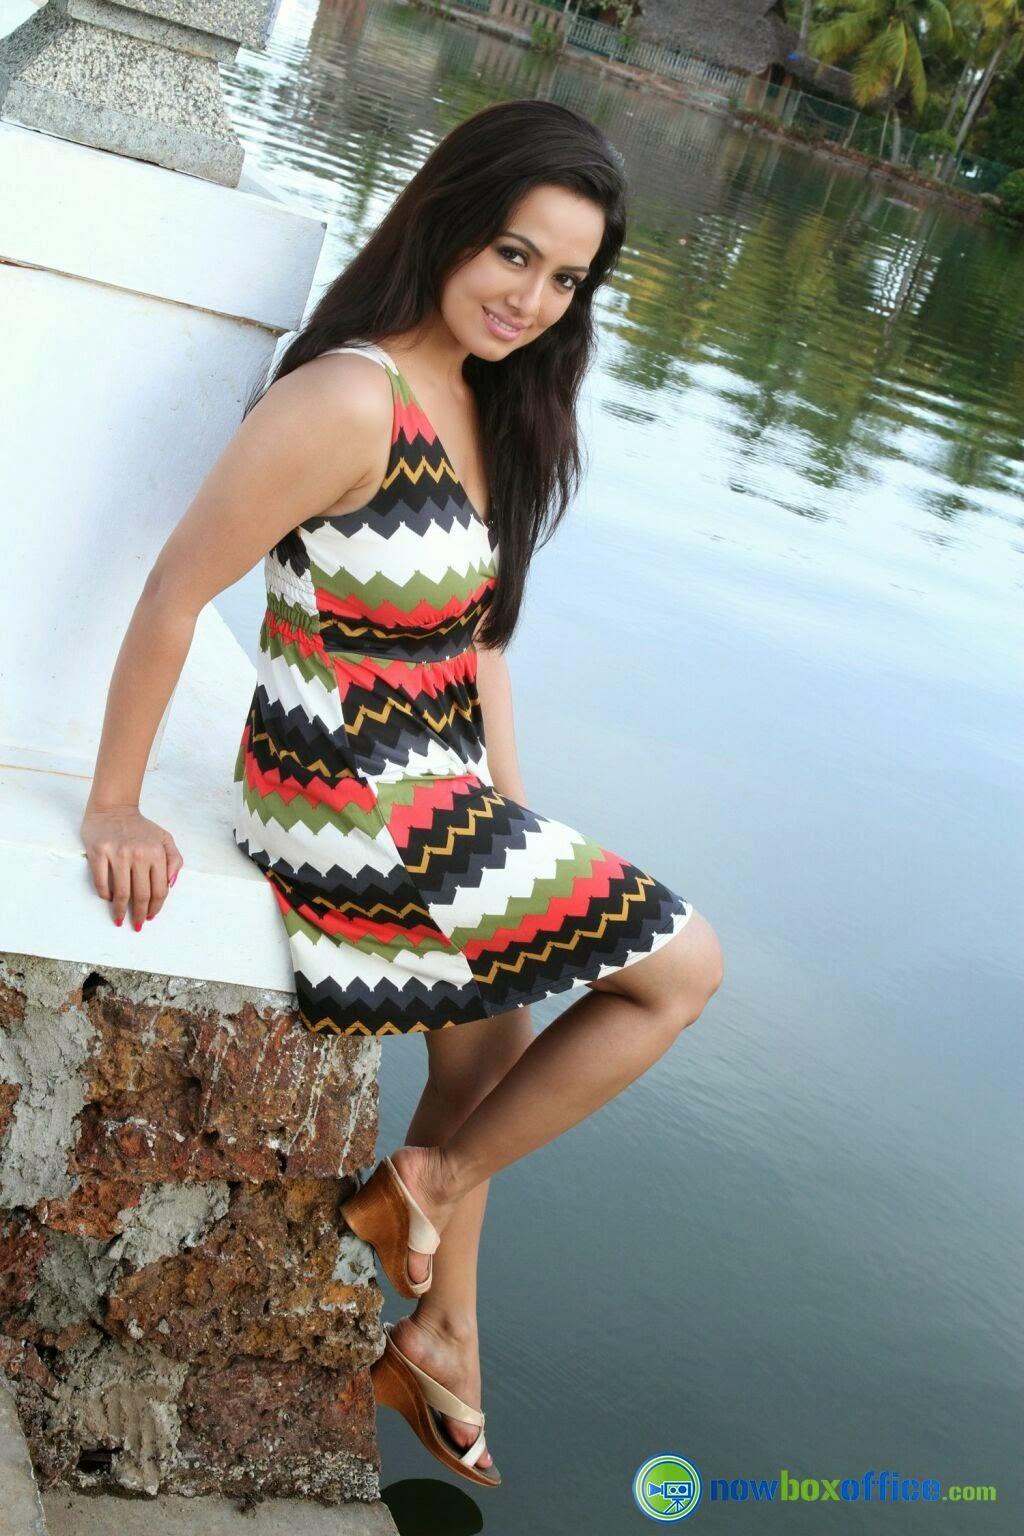 Sana Khan full Hot HD Wallpapers & Sexy Photos Gallery